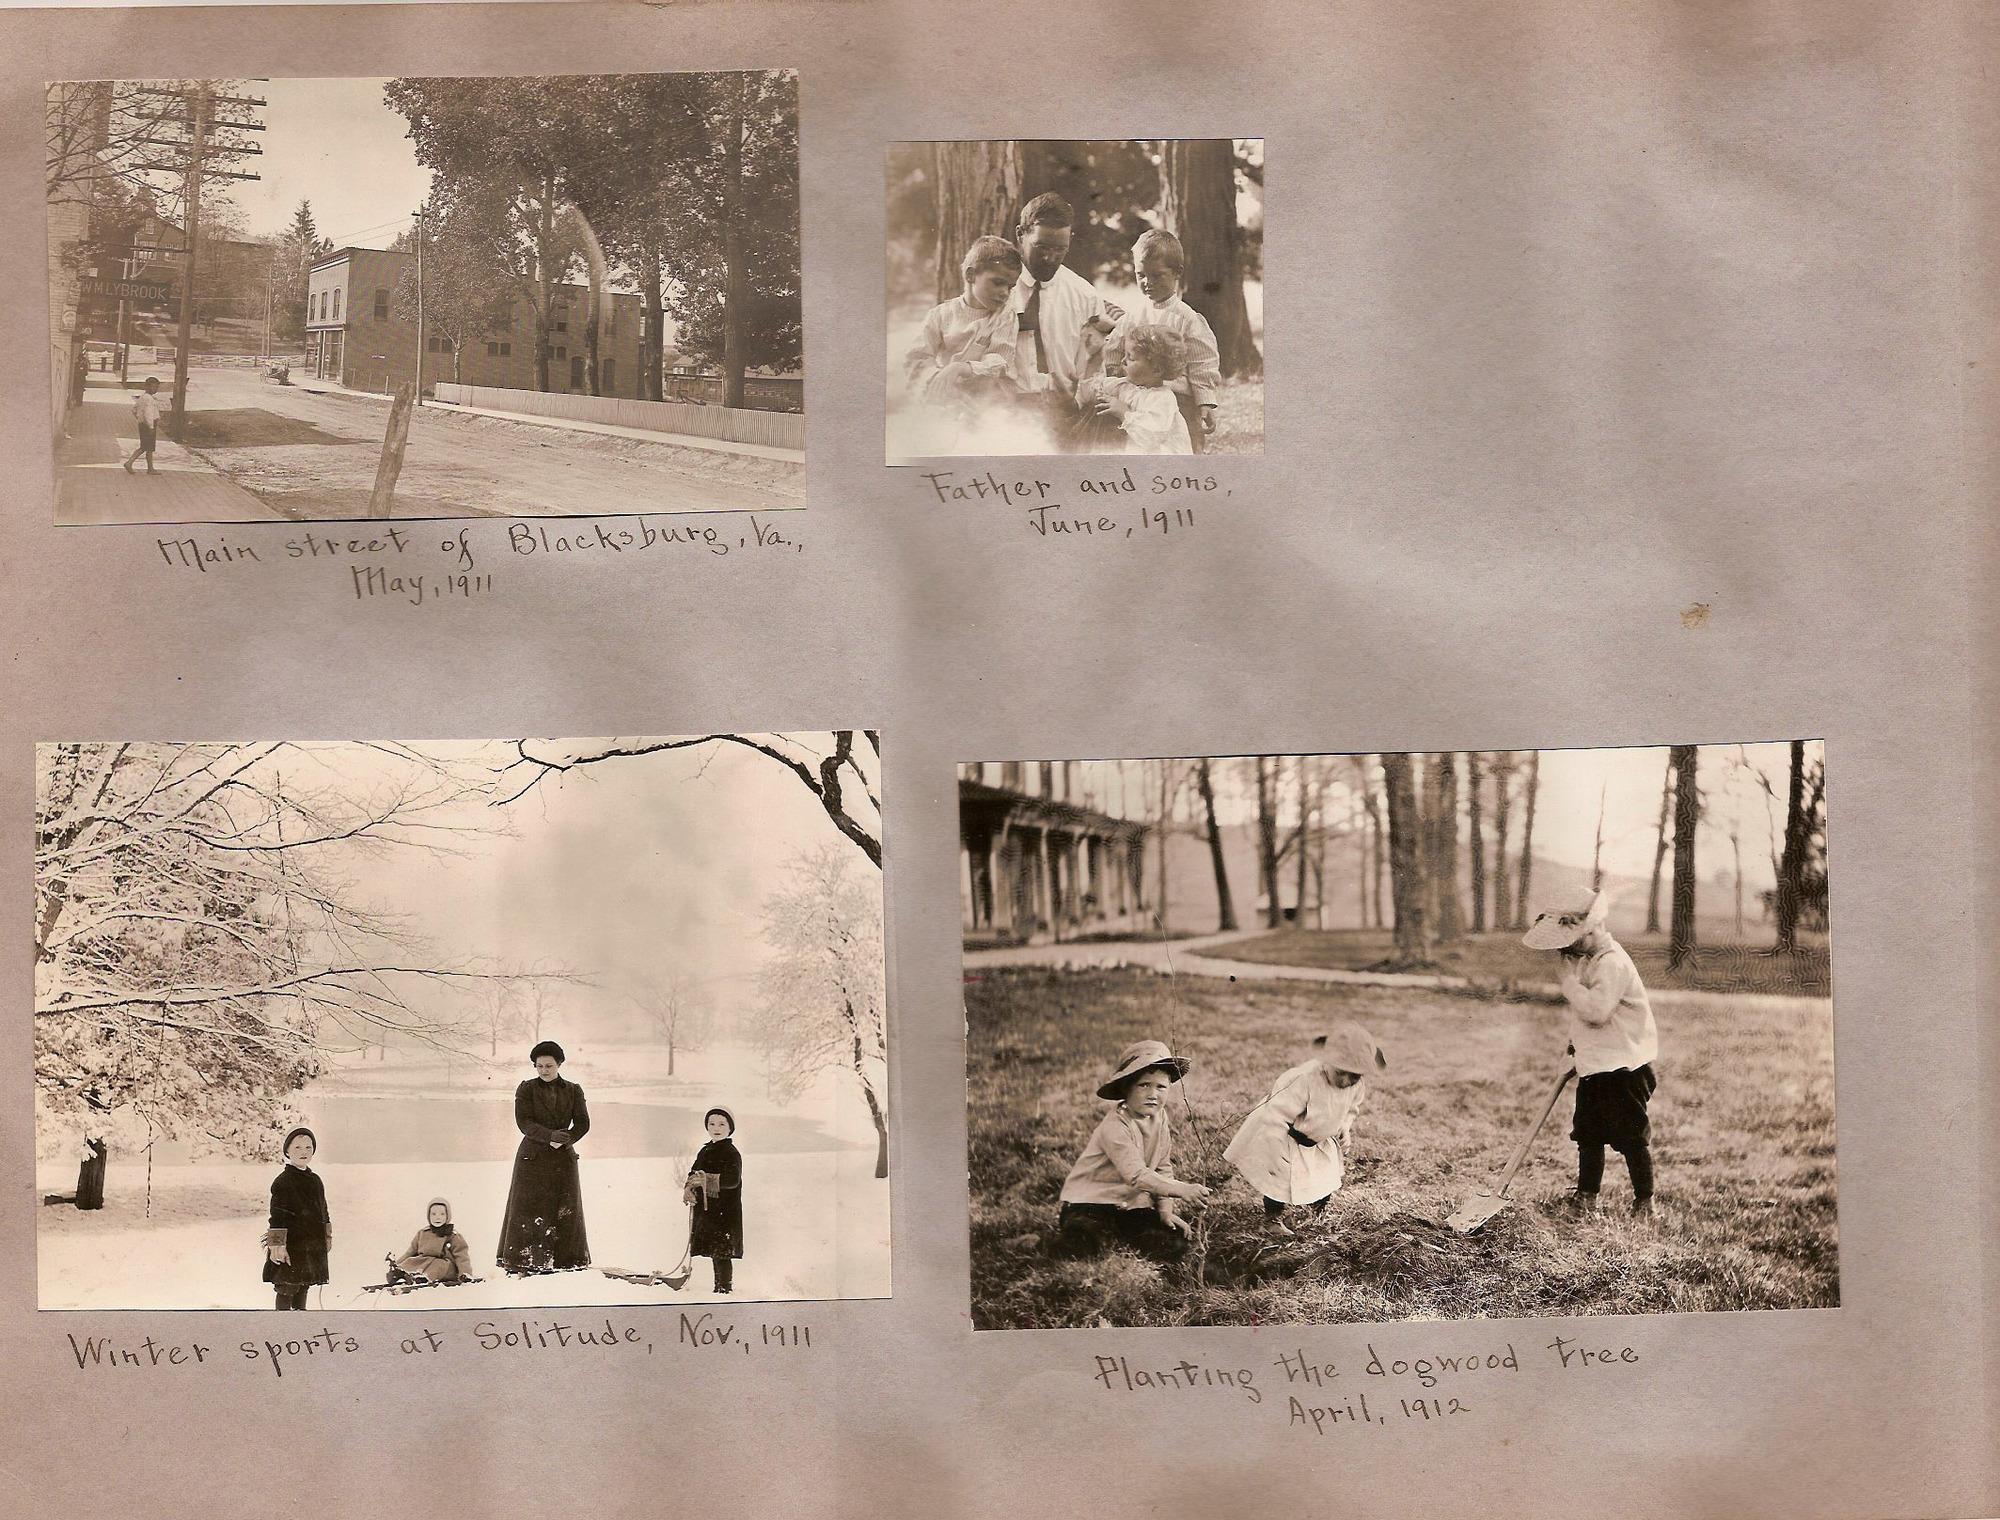 Fletcher_RFletcherPhotos_ScrapbookPage06_1911-1912.jpg